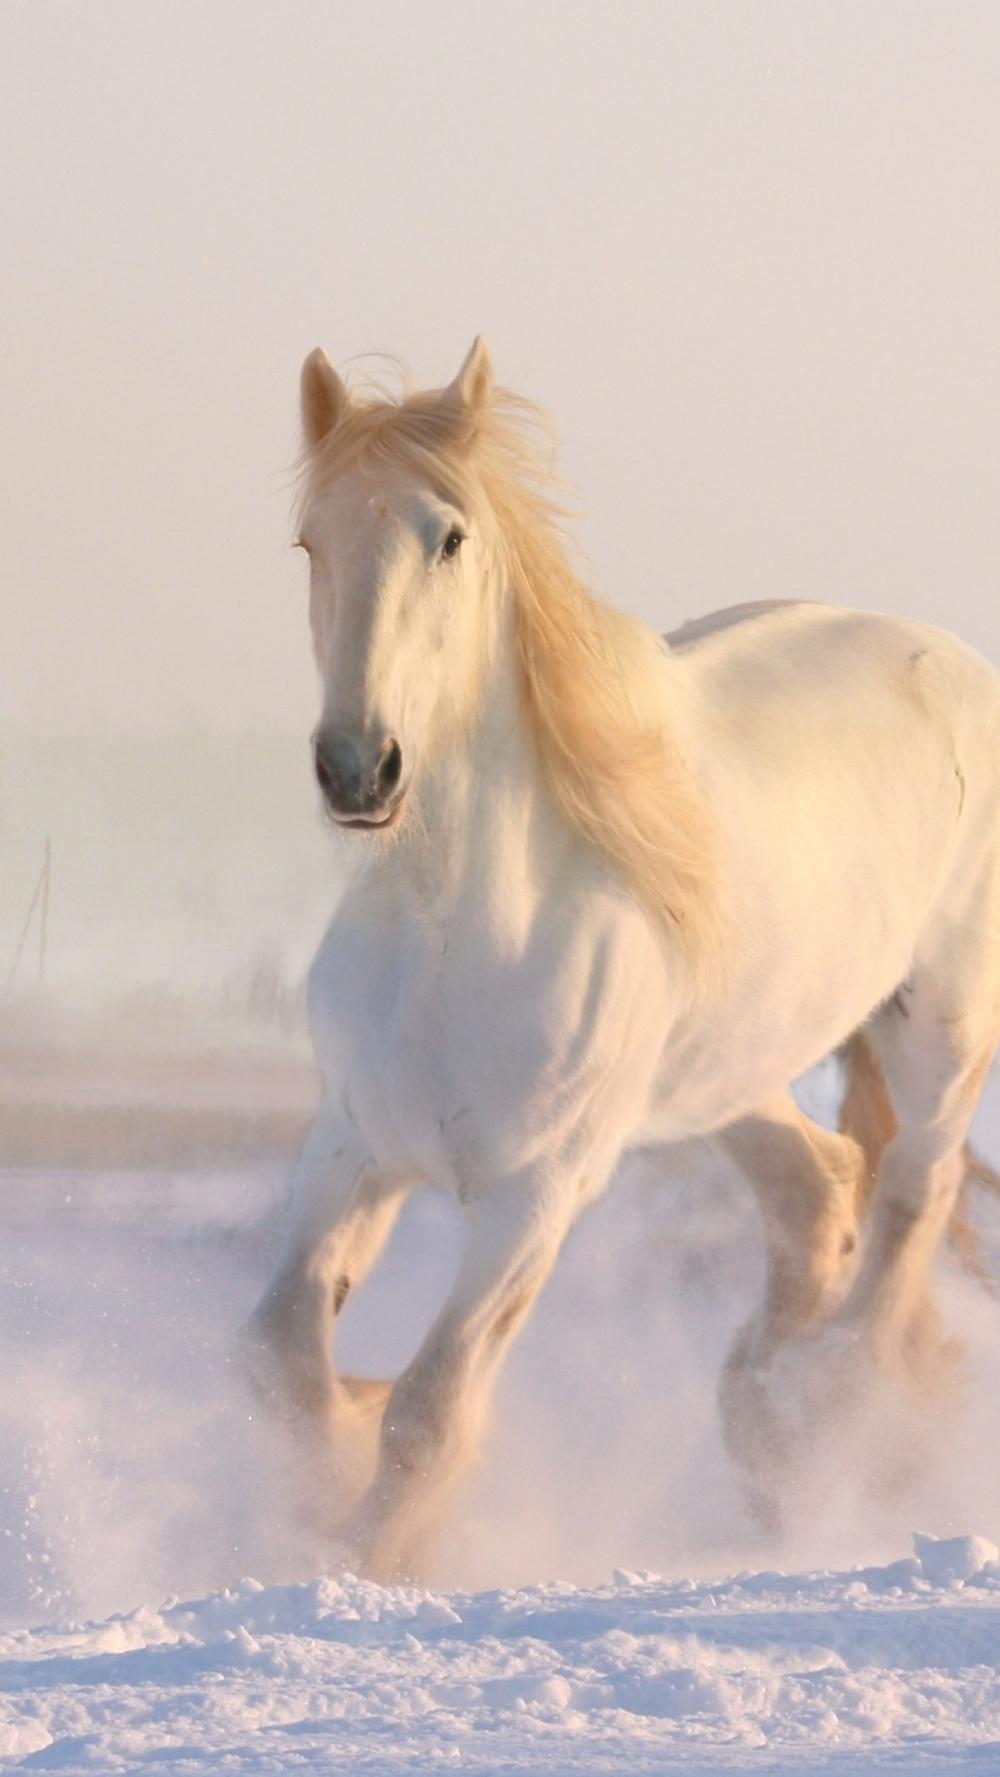 White Horse Running Through Snow Horse Wallpaper Horses Beautiful Horses